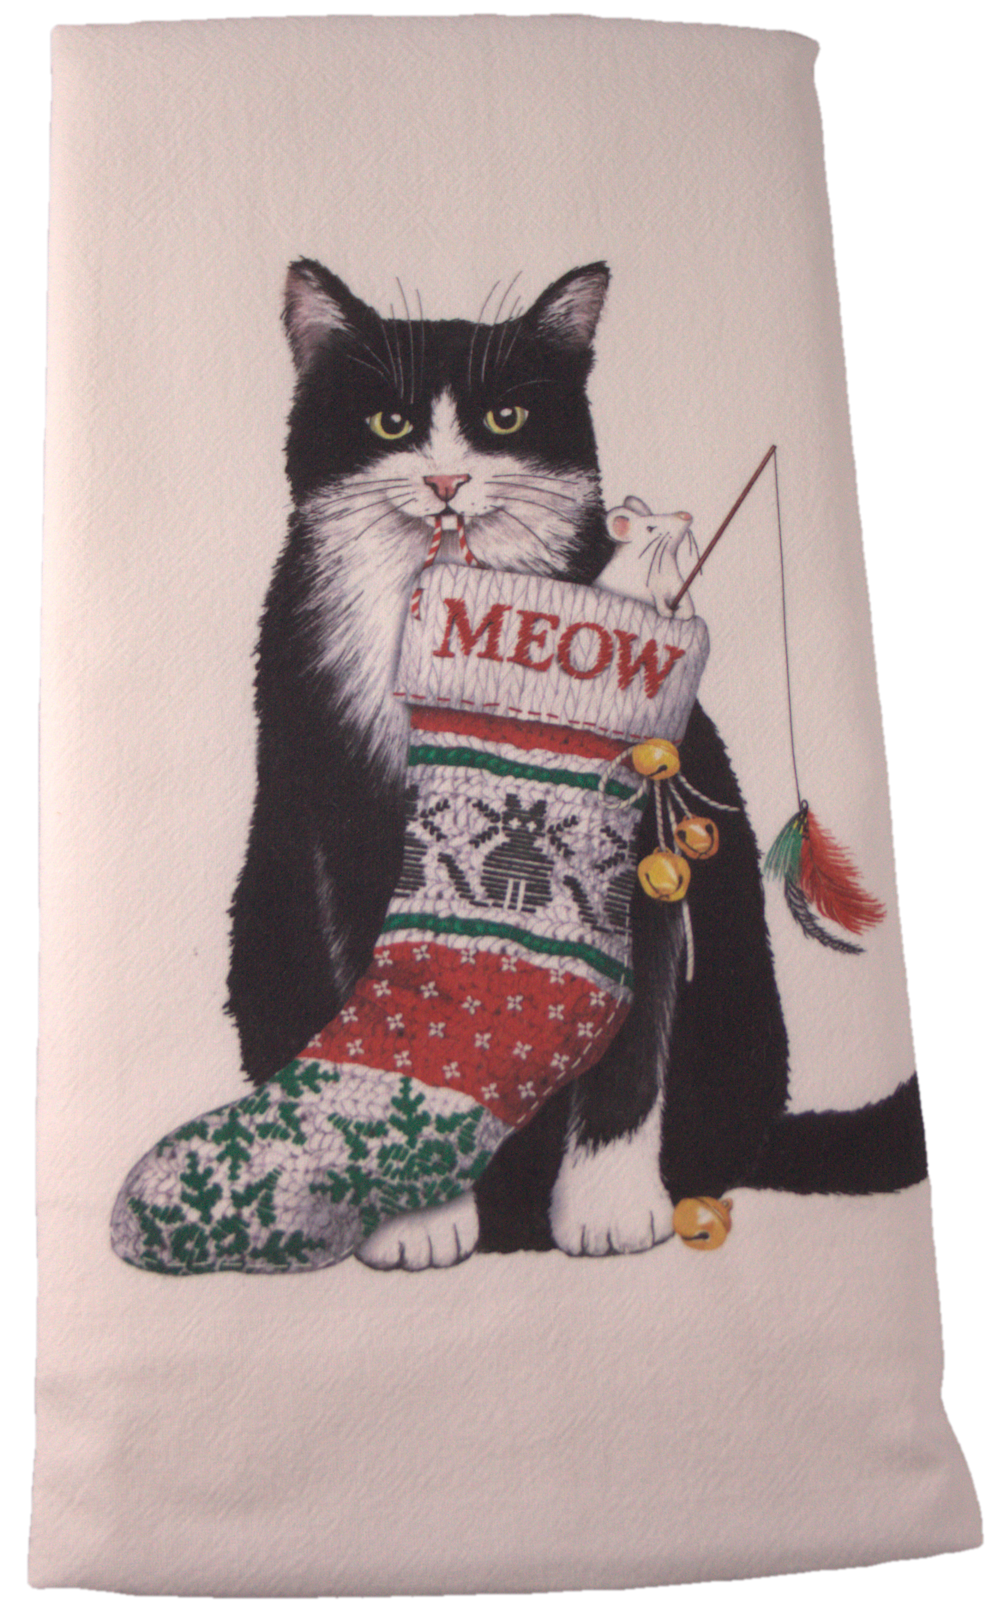 Tuxedo Cat Christmas Flour Sack Dish Towel